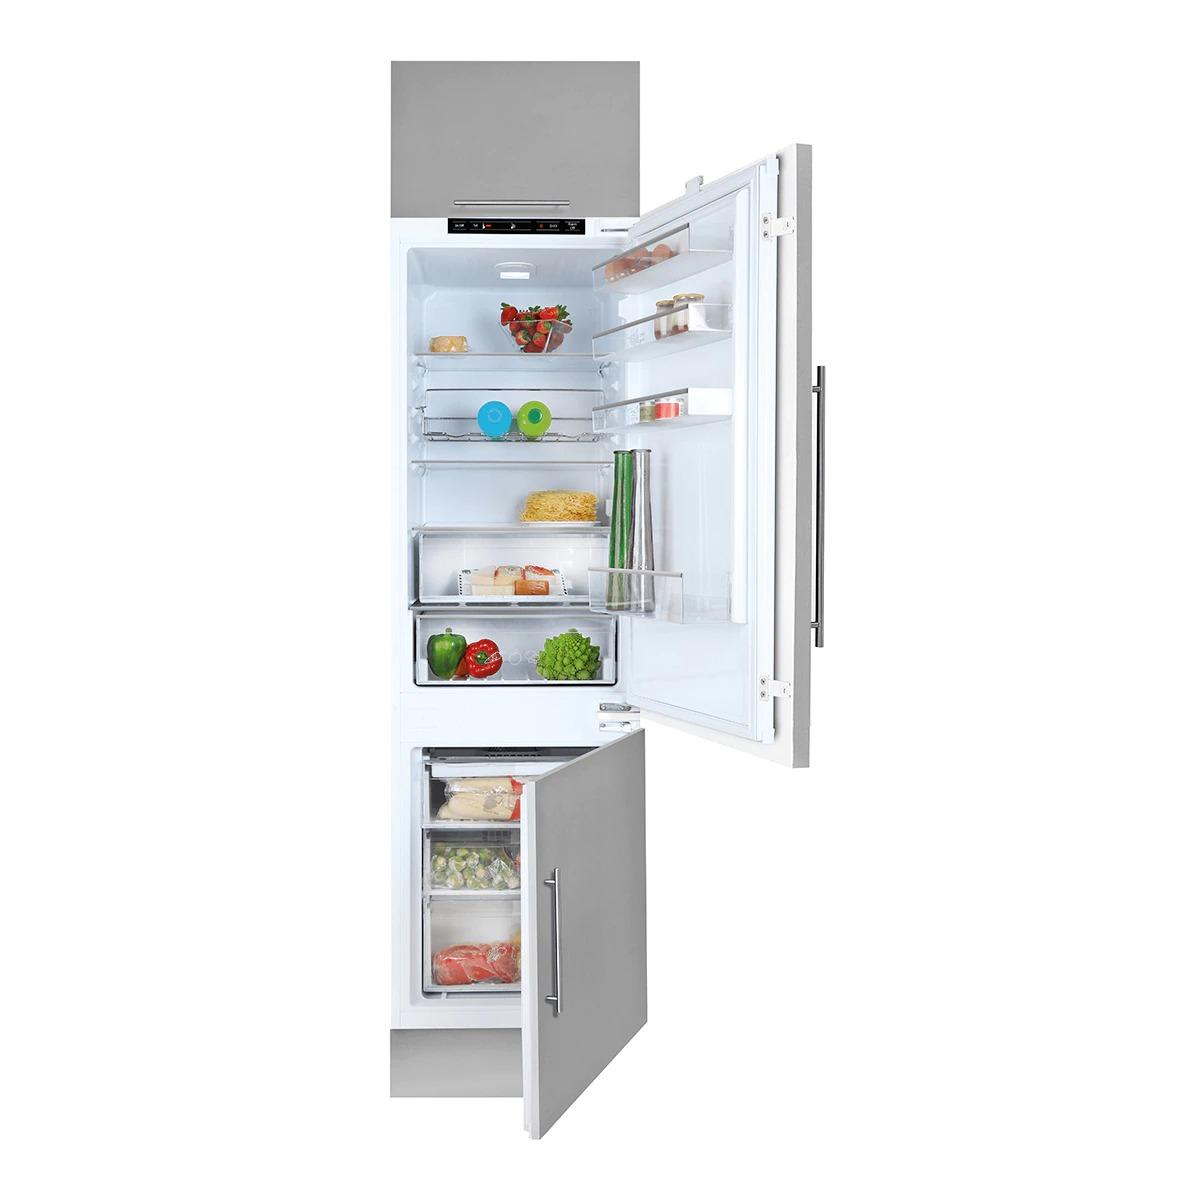 Teka CI3 350 NF built-in fridge freezer with No Frost freezer